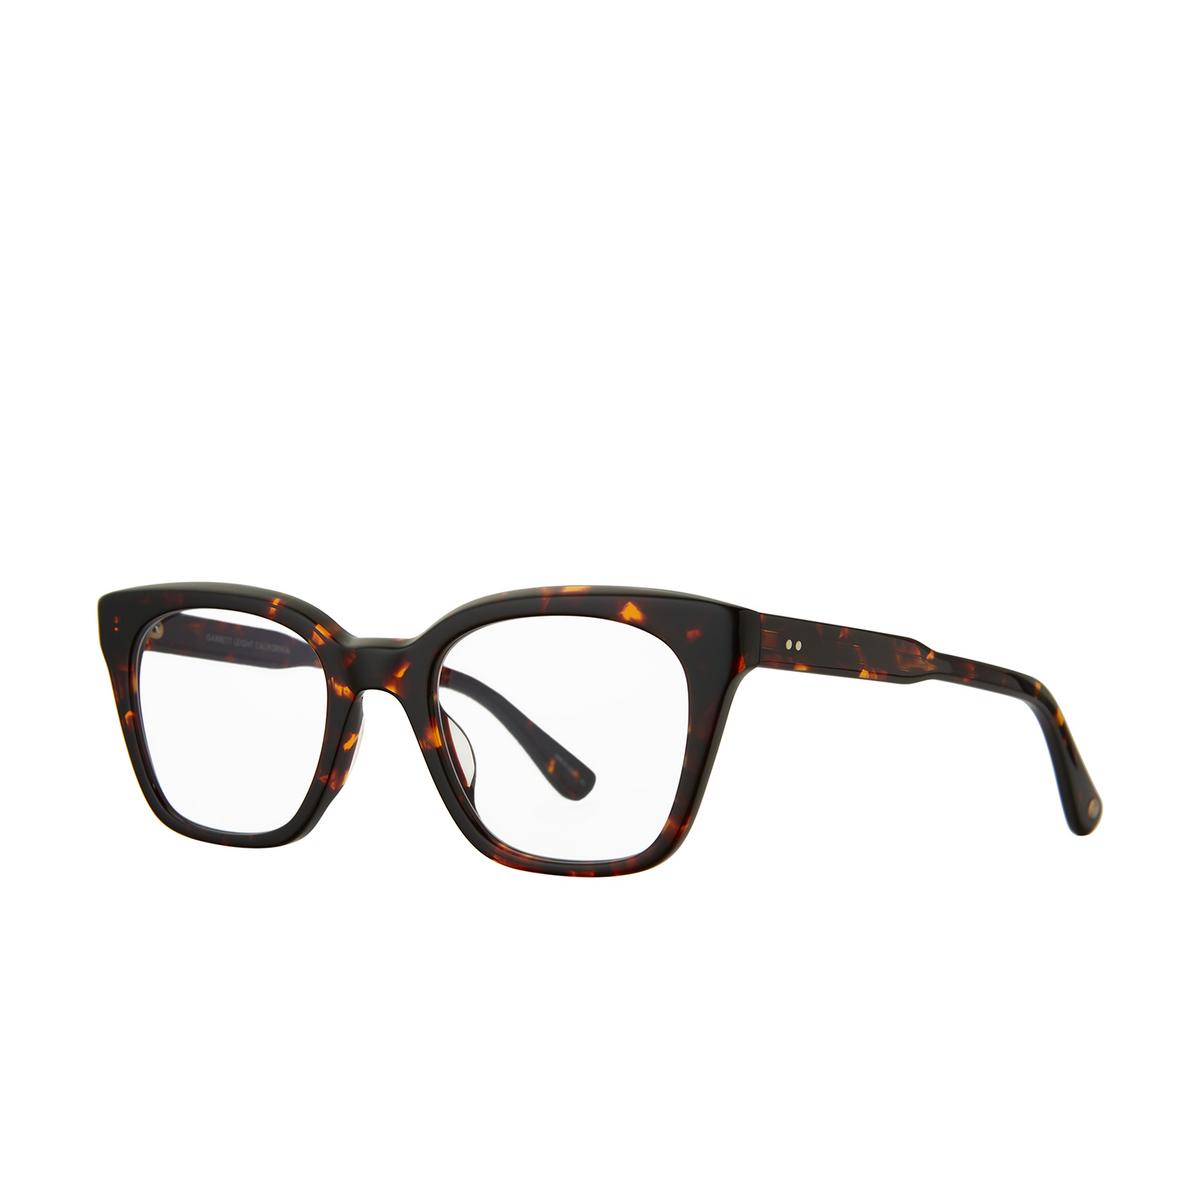 Garrett Leight® Cat-eye Eyeglasses: El Rey color Caviar Tortoise Cavt.